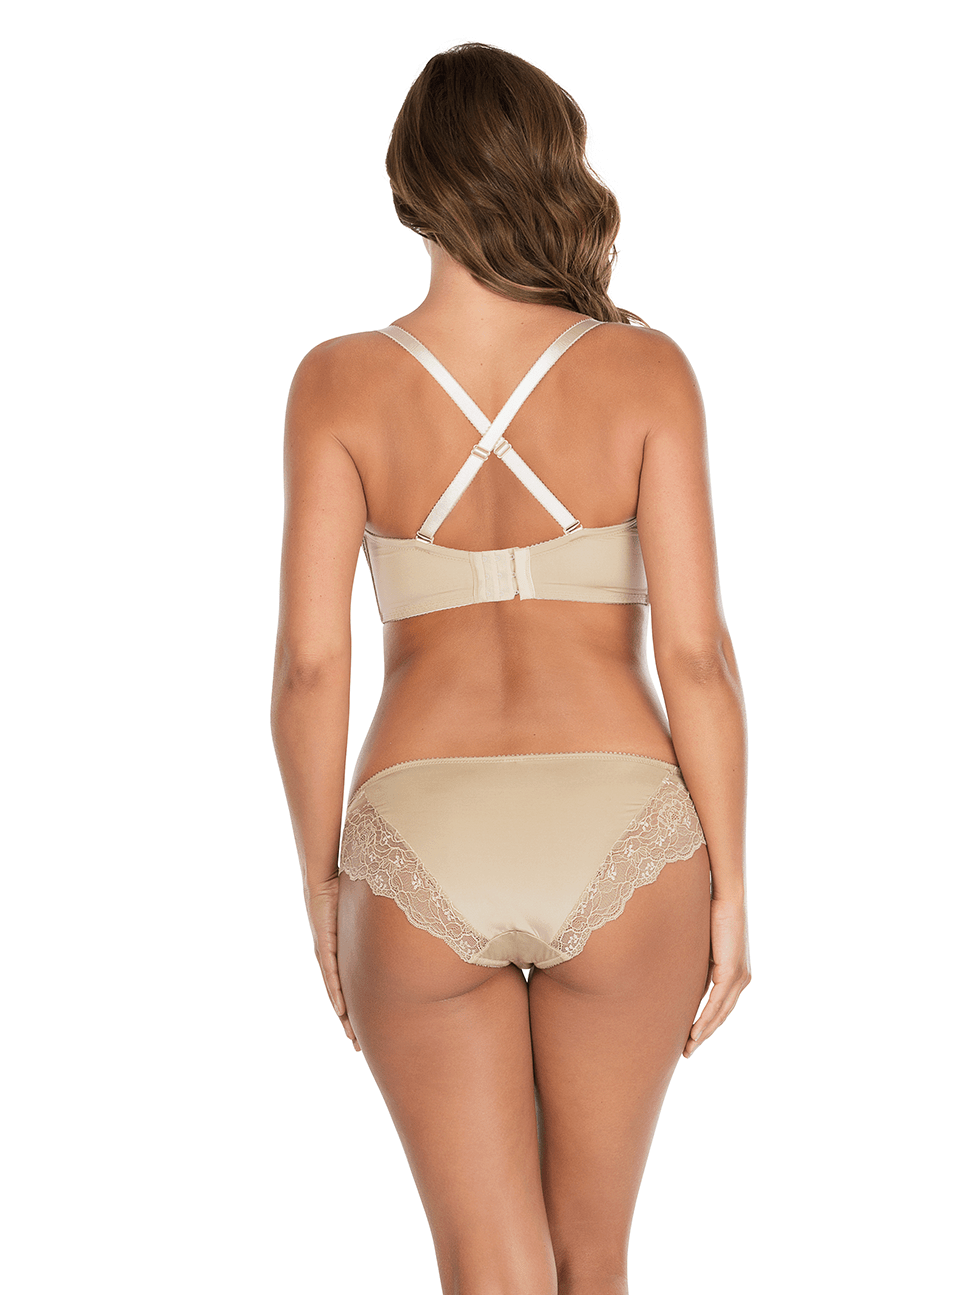 Elissa ContourUnderwireBraP5011 BikiniP5013 ENude Cross Back - Elissa Strappless Bra - European Nude - P5011